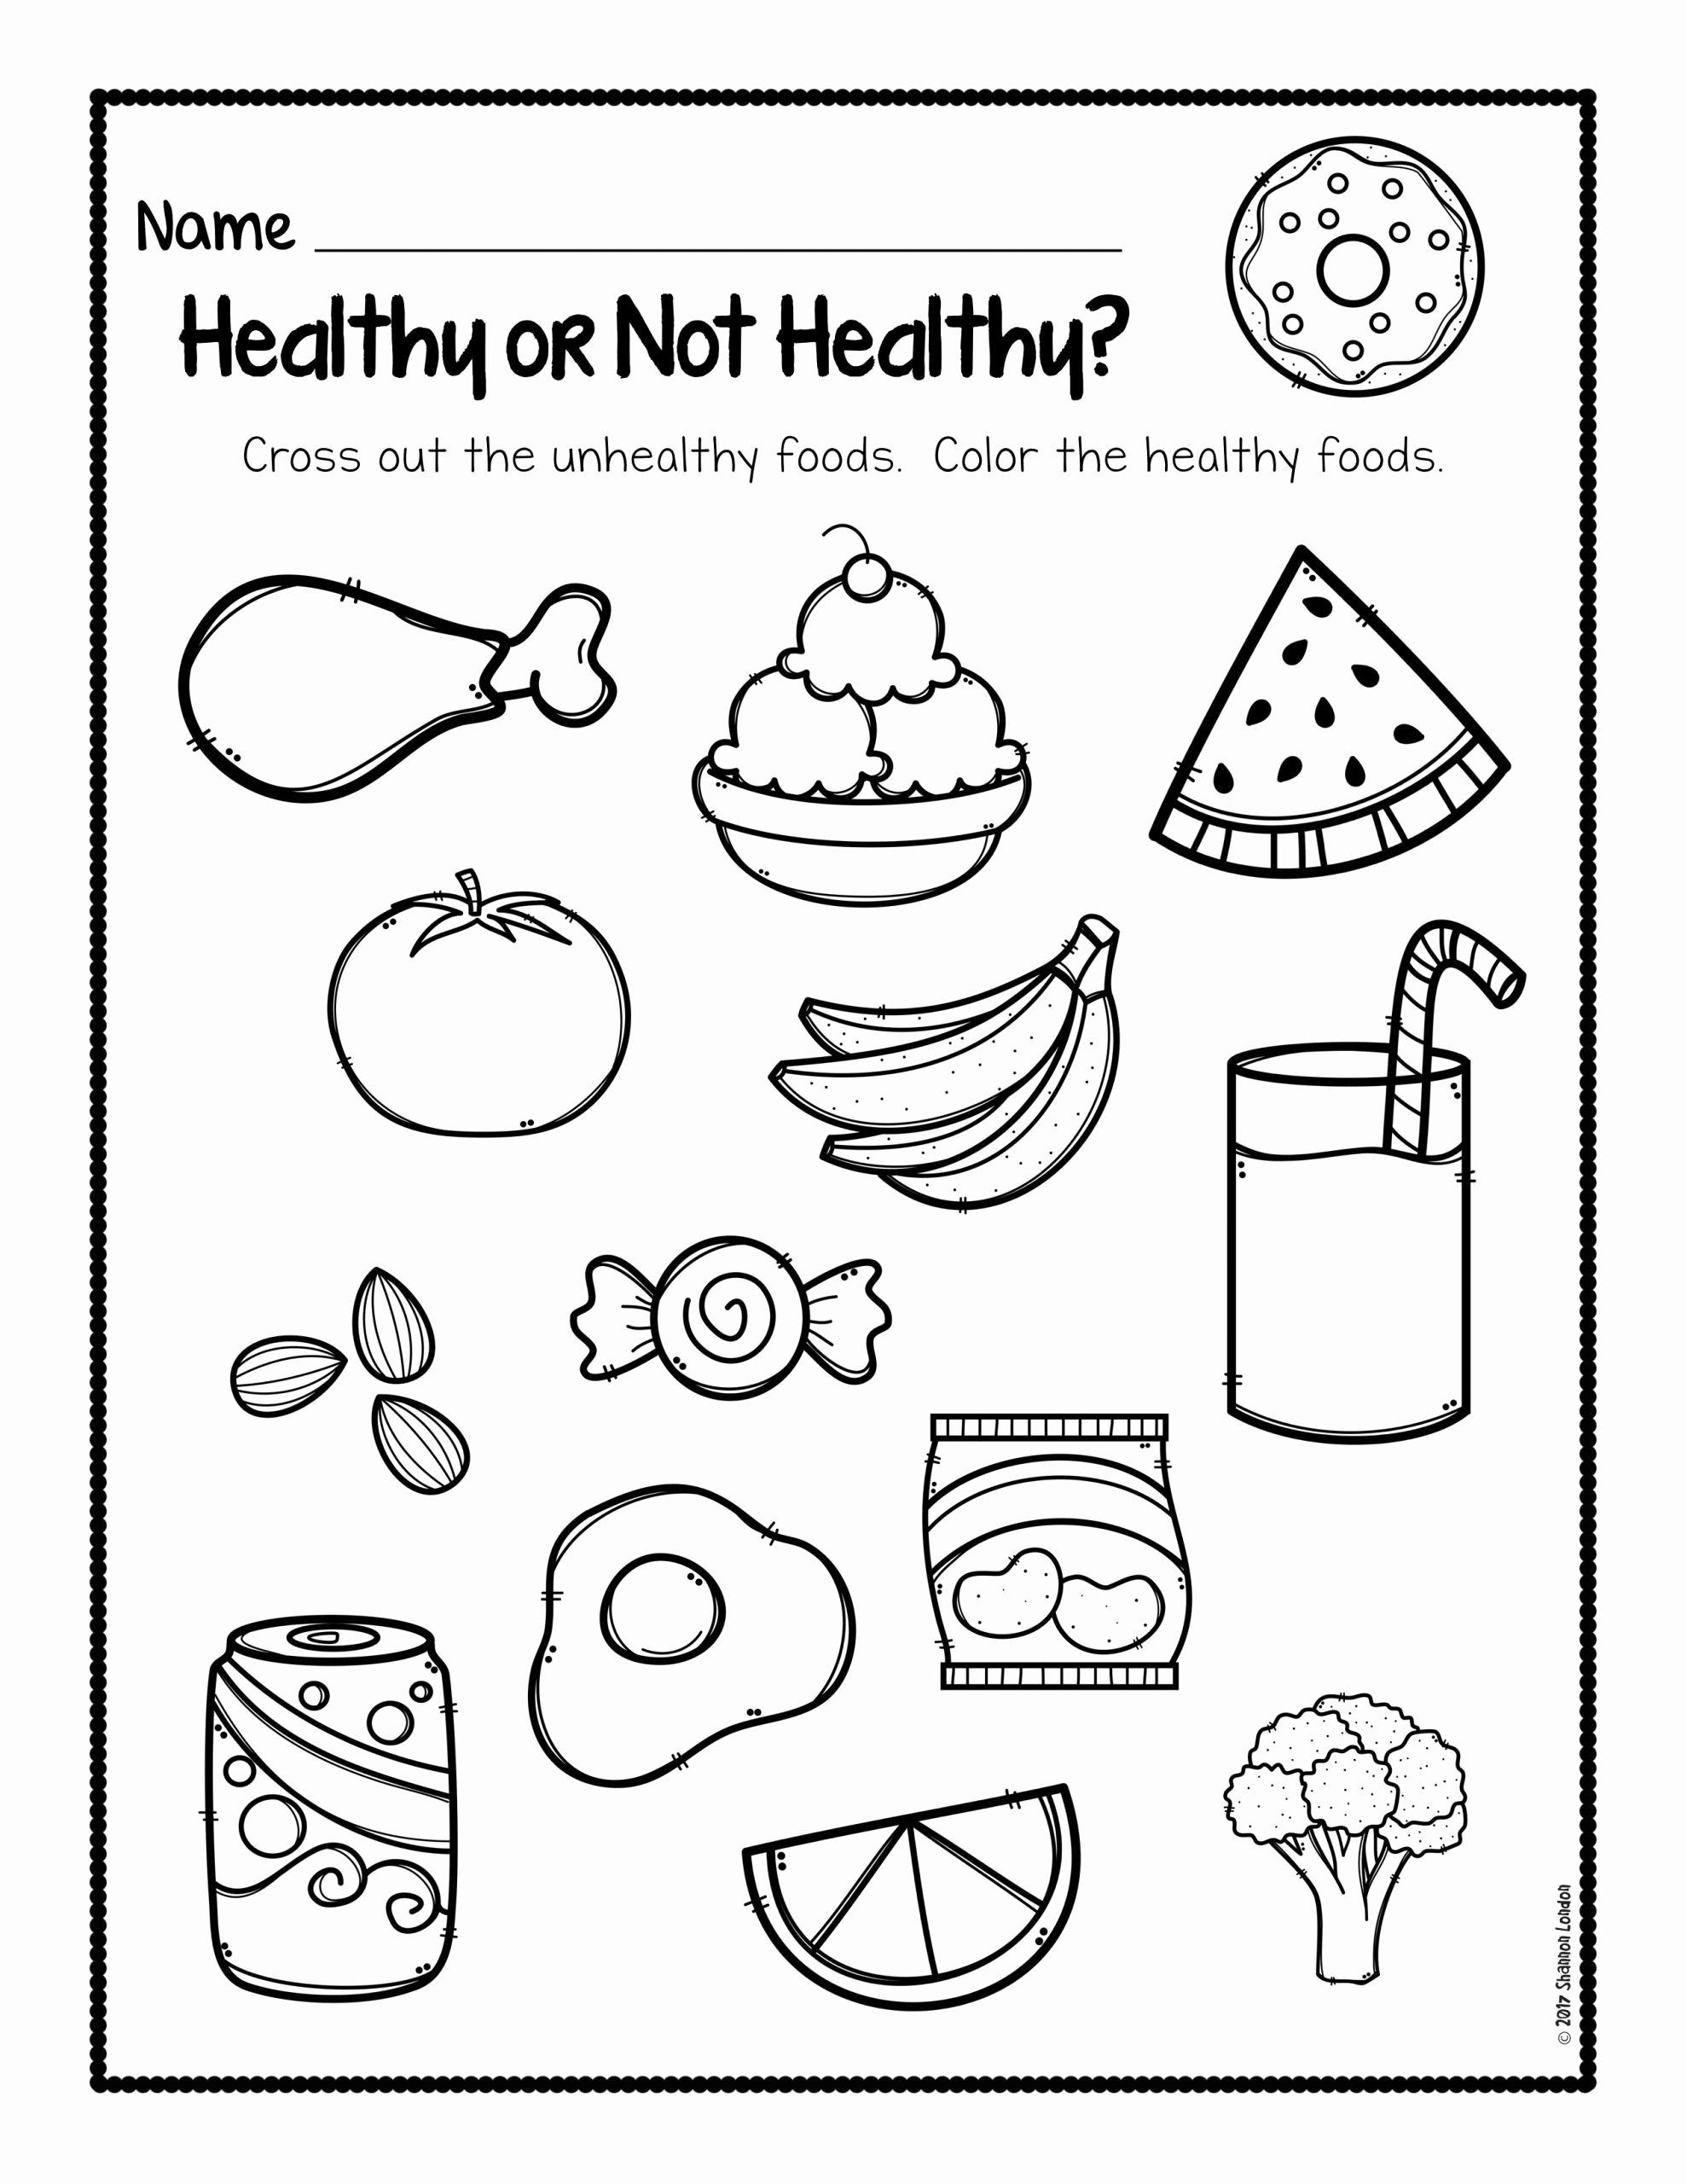 Concept Worksheets for Preschoolers Fresh Worksheets 9th Grade Biology Worksheets Printable and In